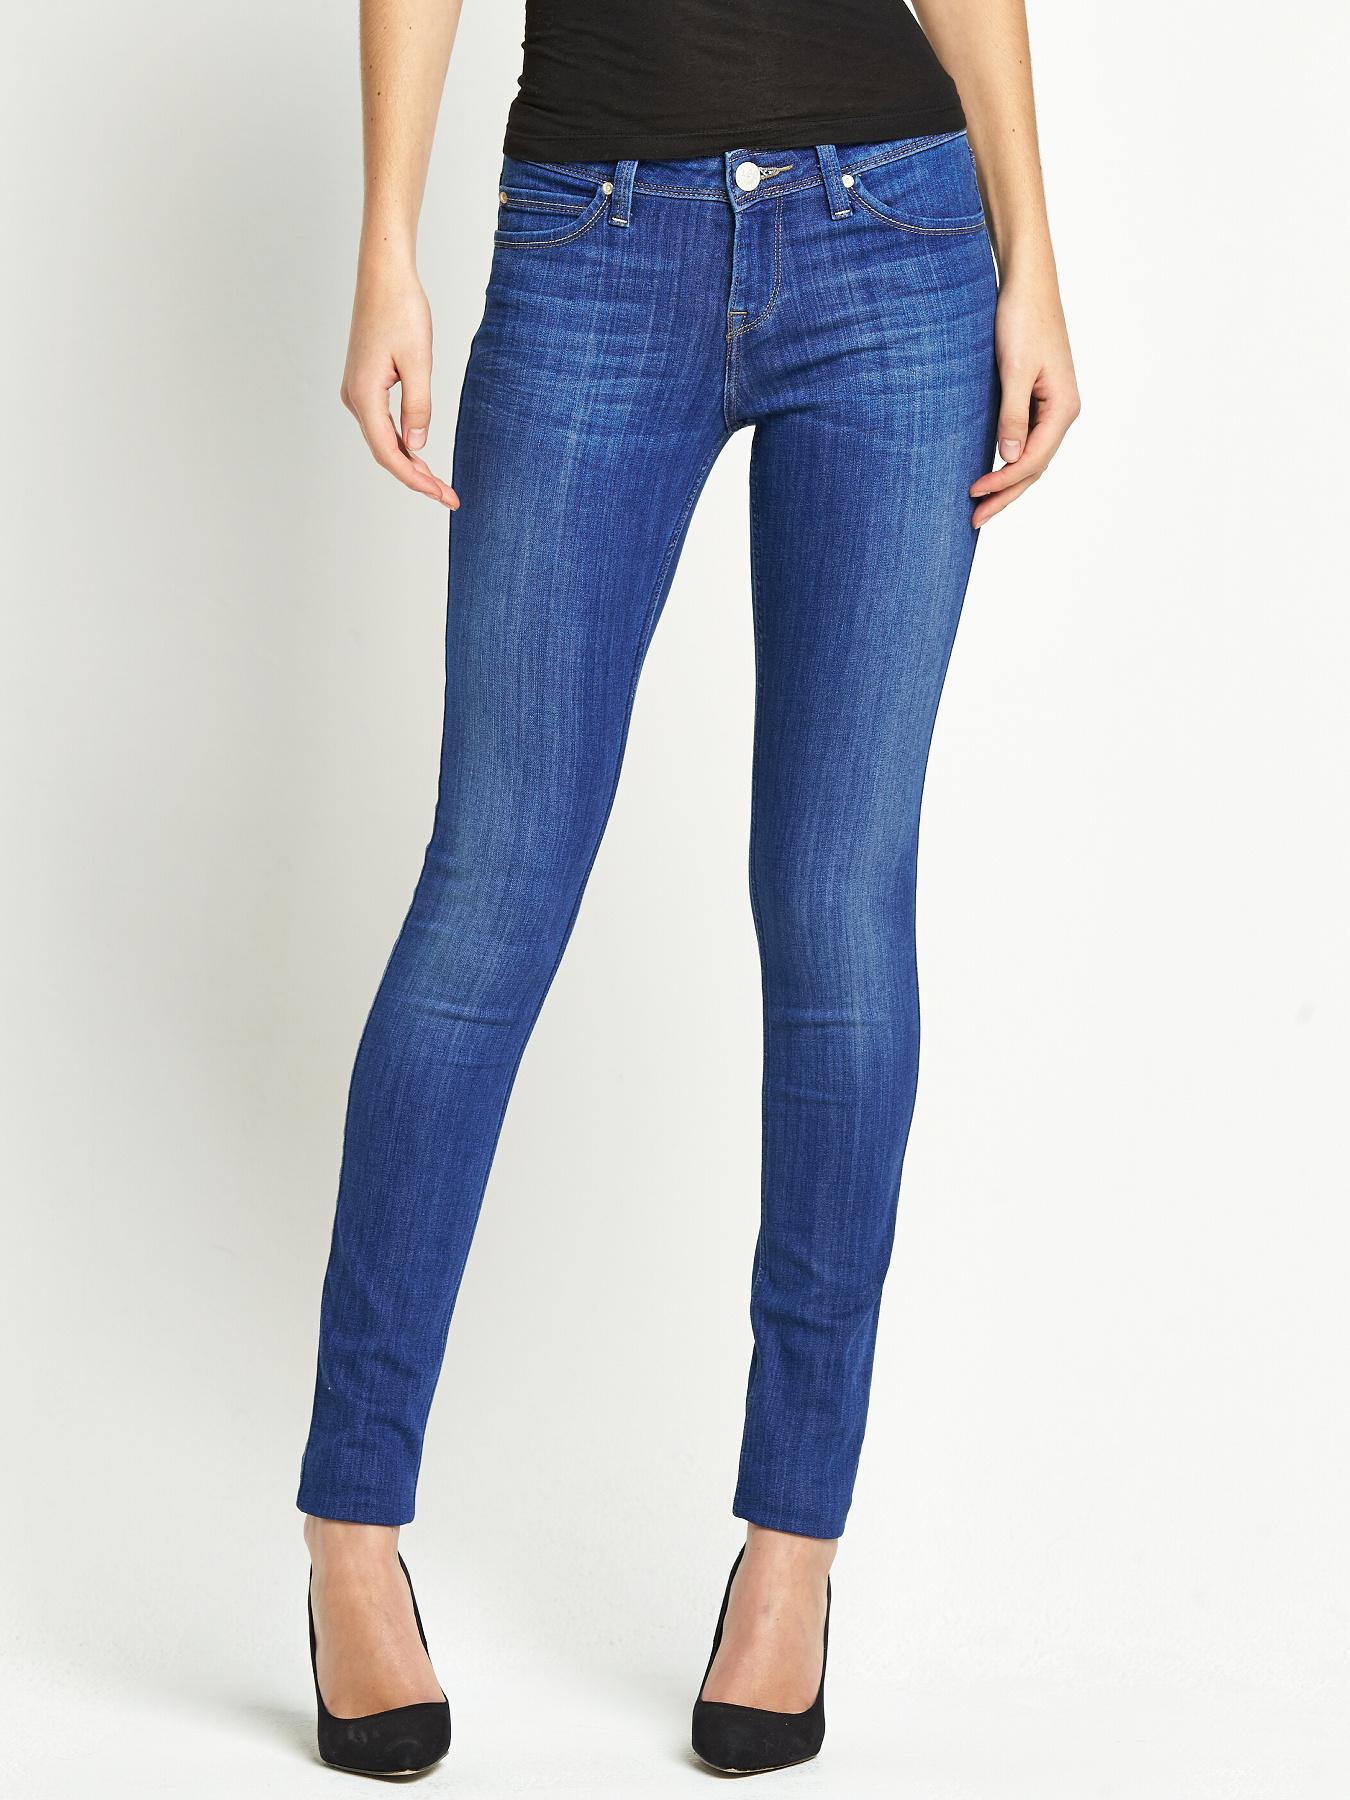 Lee Toxey Super Skinny Jeans - Indigo, Indigo